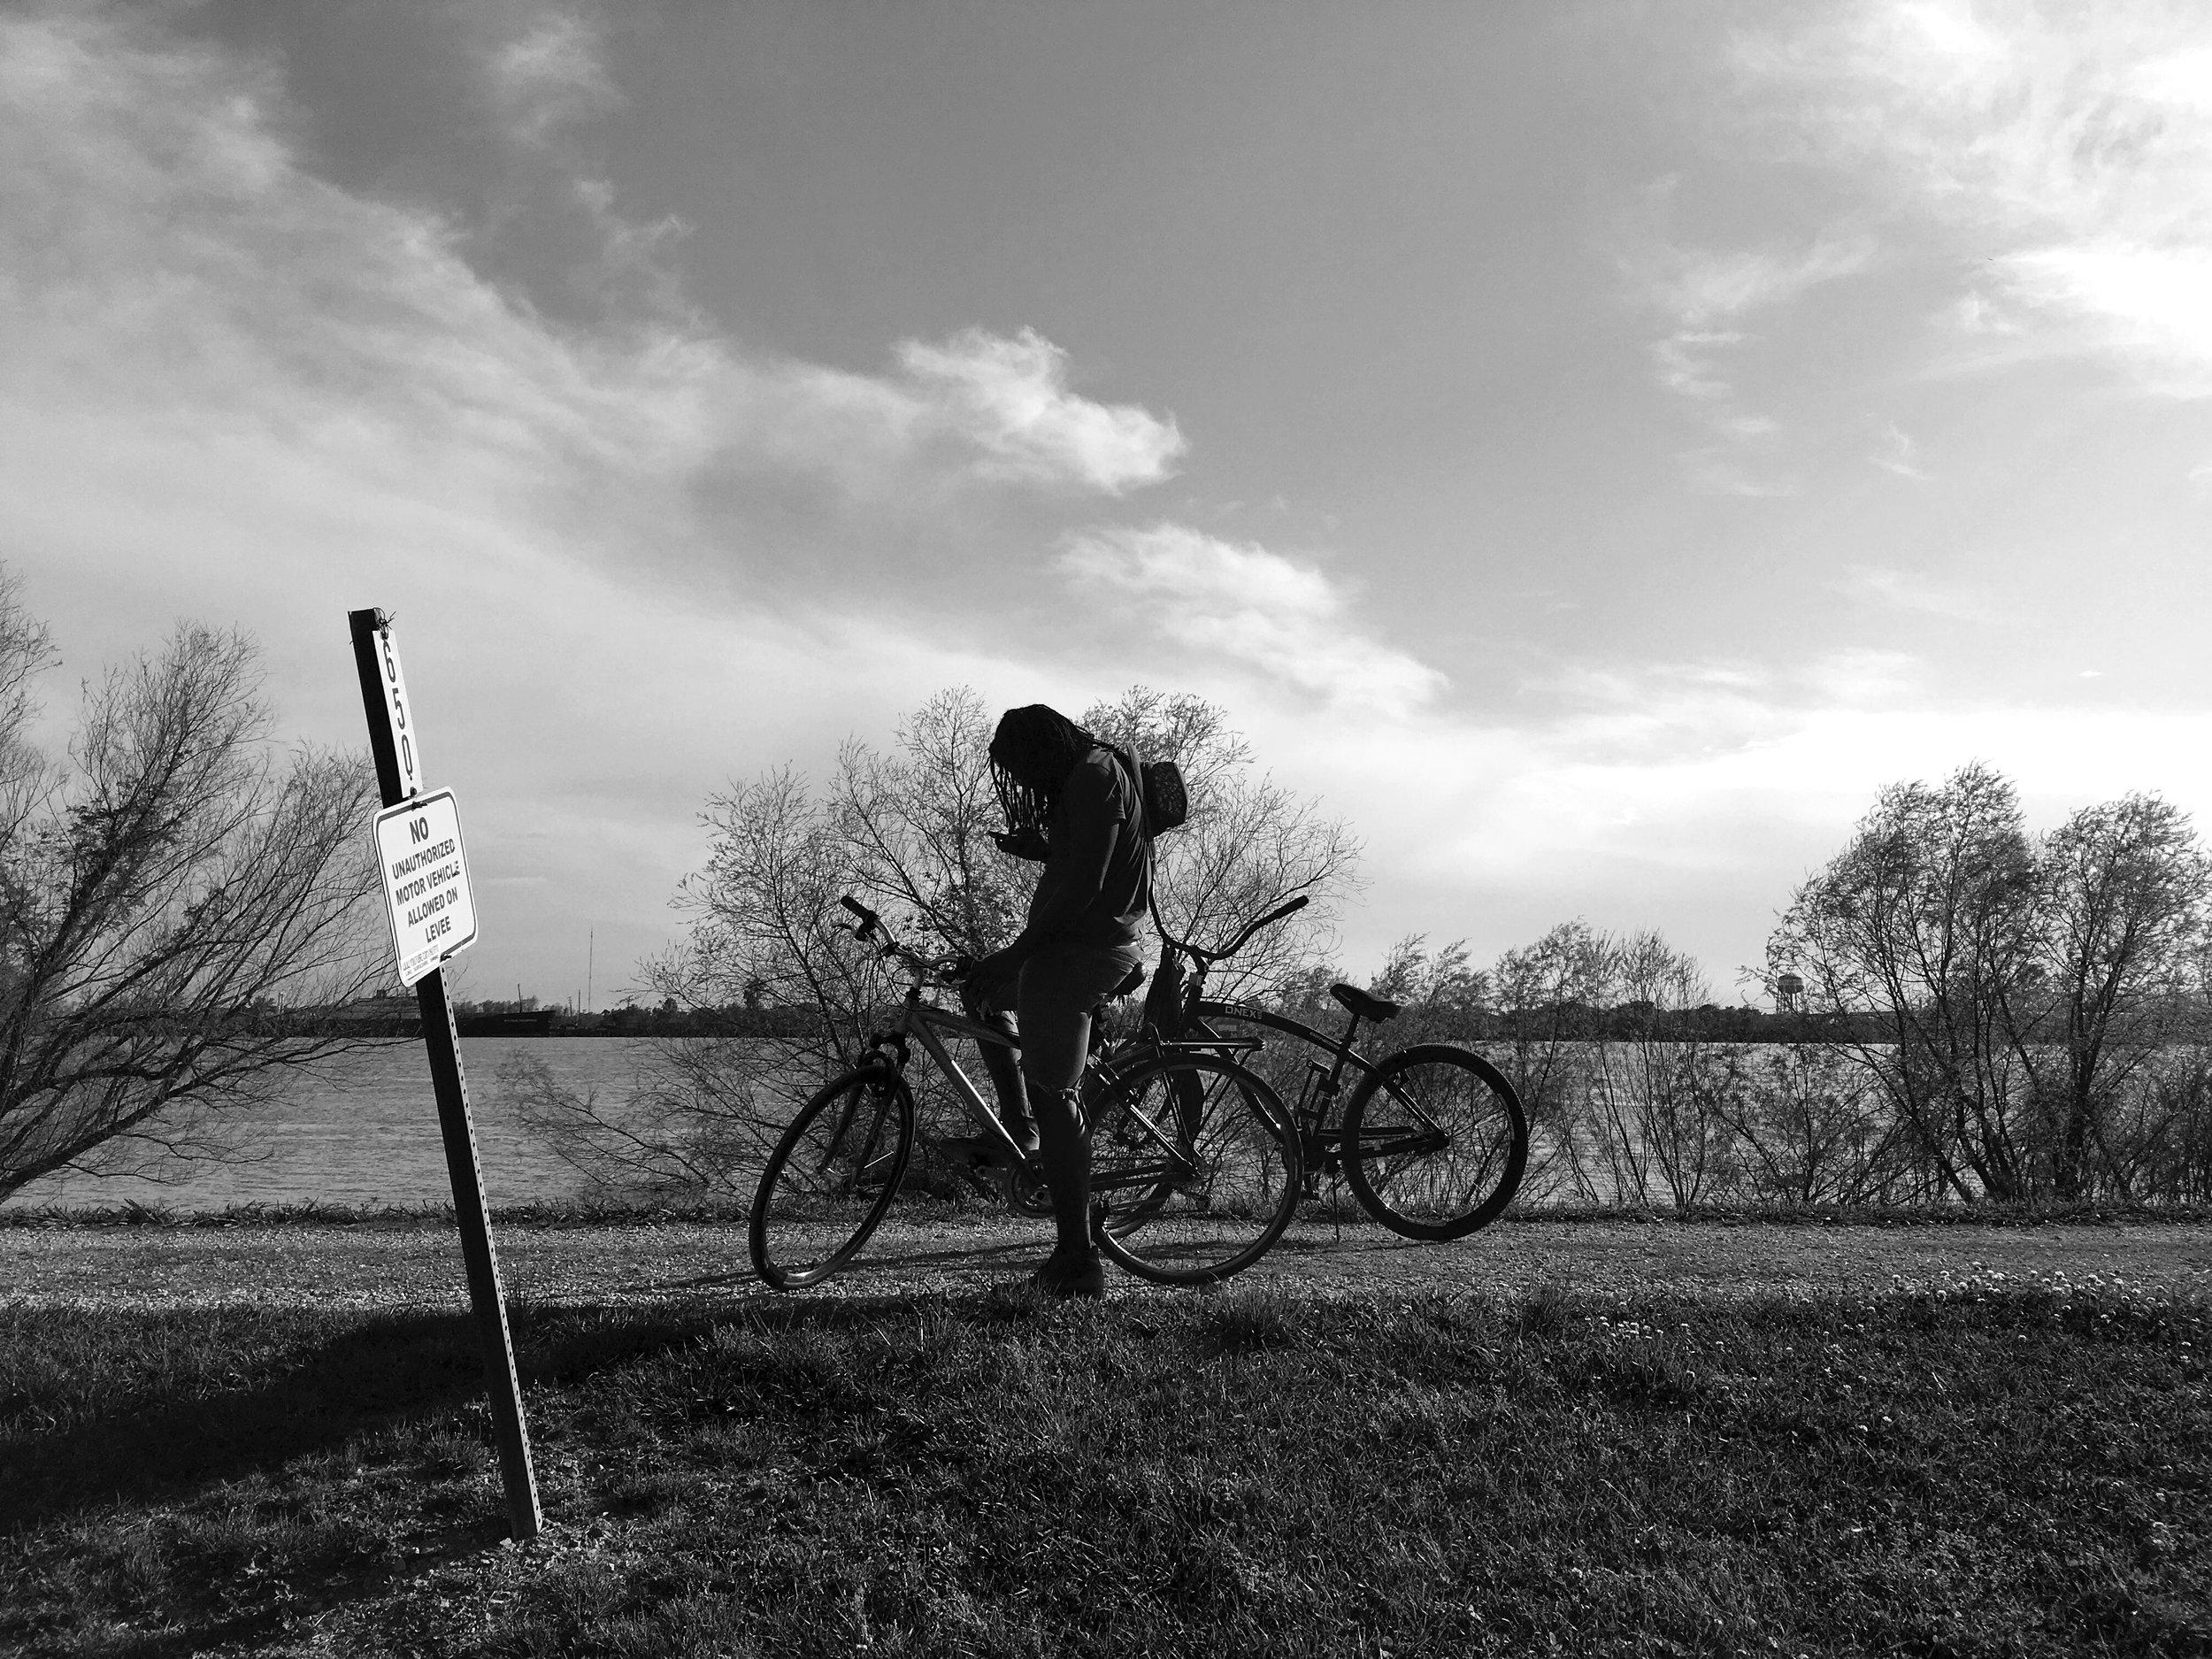 16_04_NOLA_BikeOnLevee.jpg